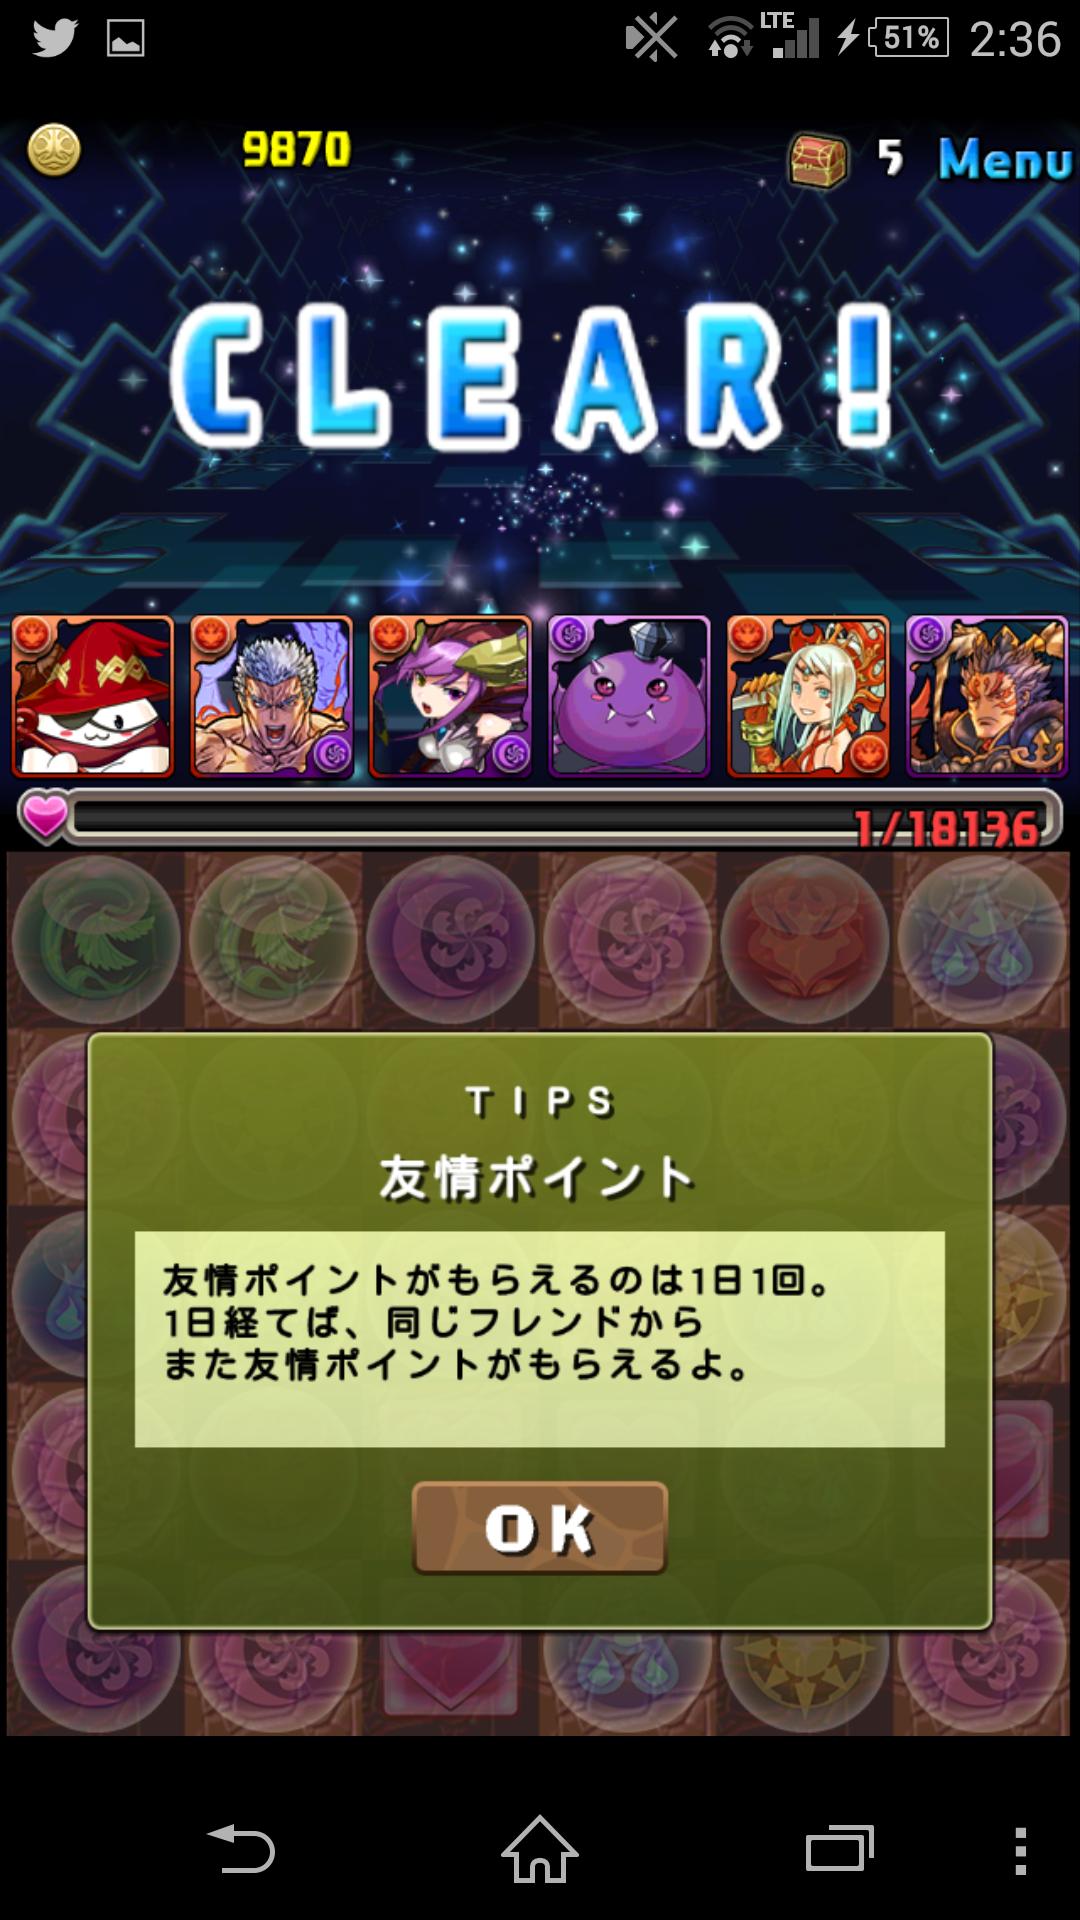 Screenshot_2015-02-18-02-36-39.png